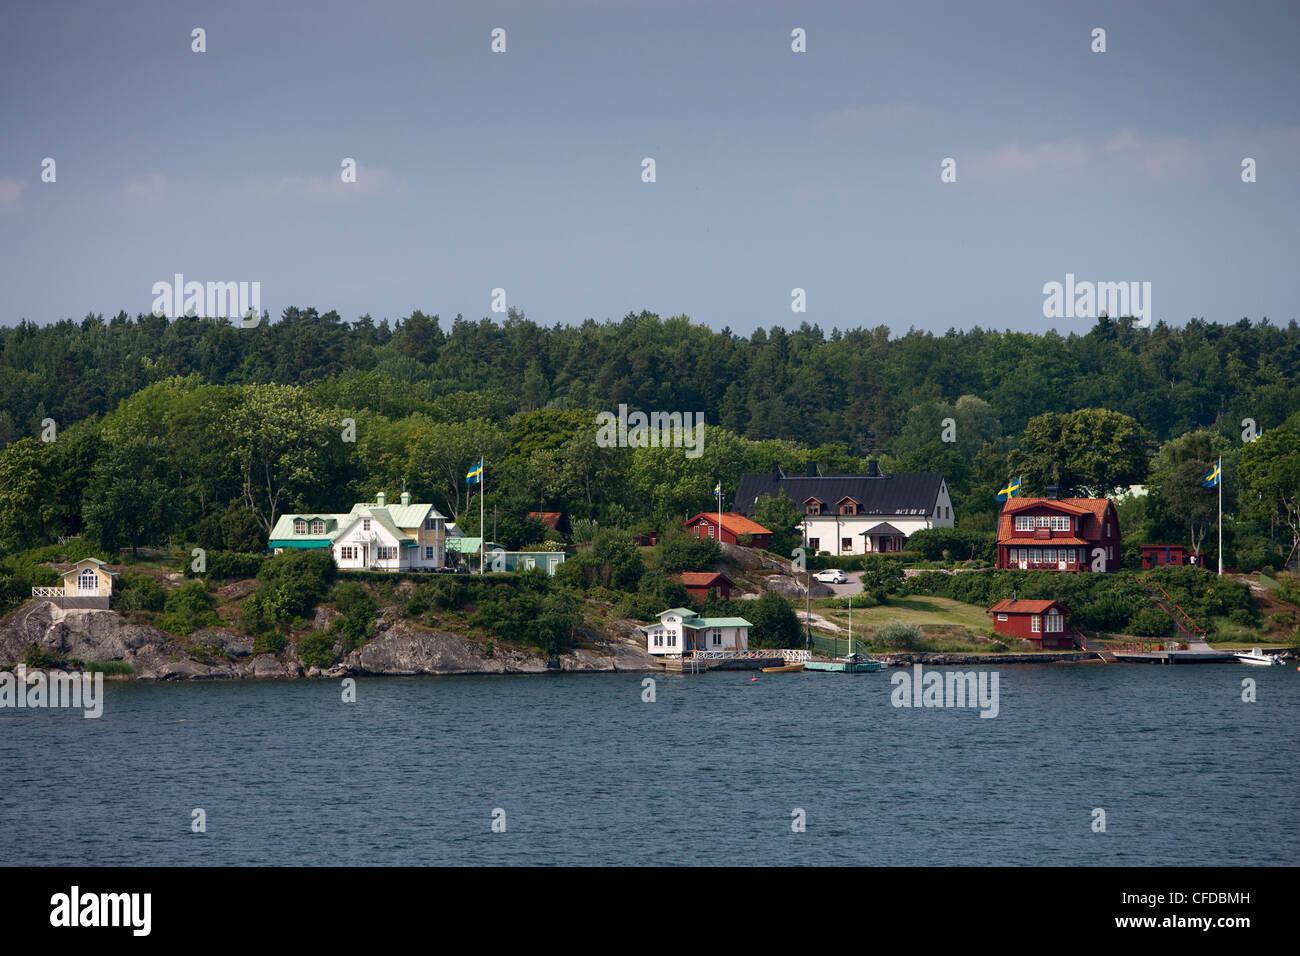 Houses in the Stockholm archipelago, near Stockholm, Stockholm, Sweden Stock Photo